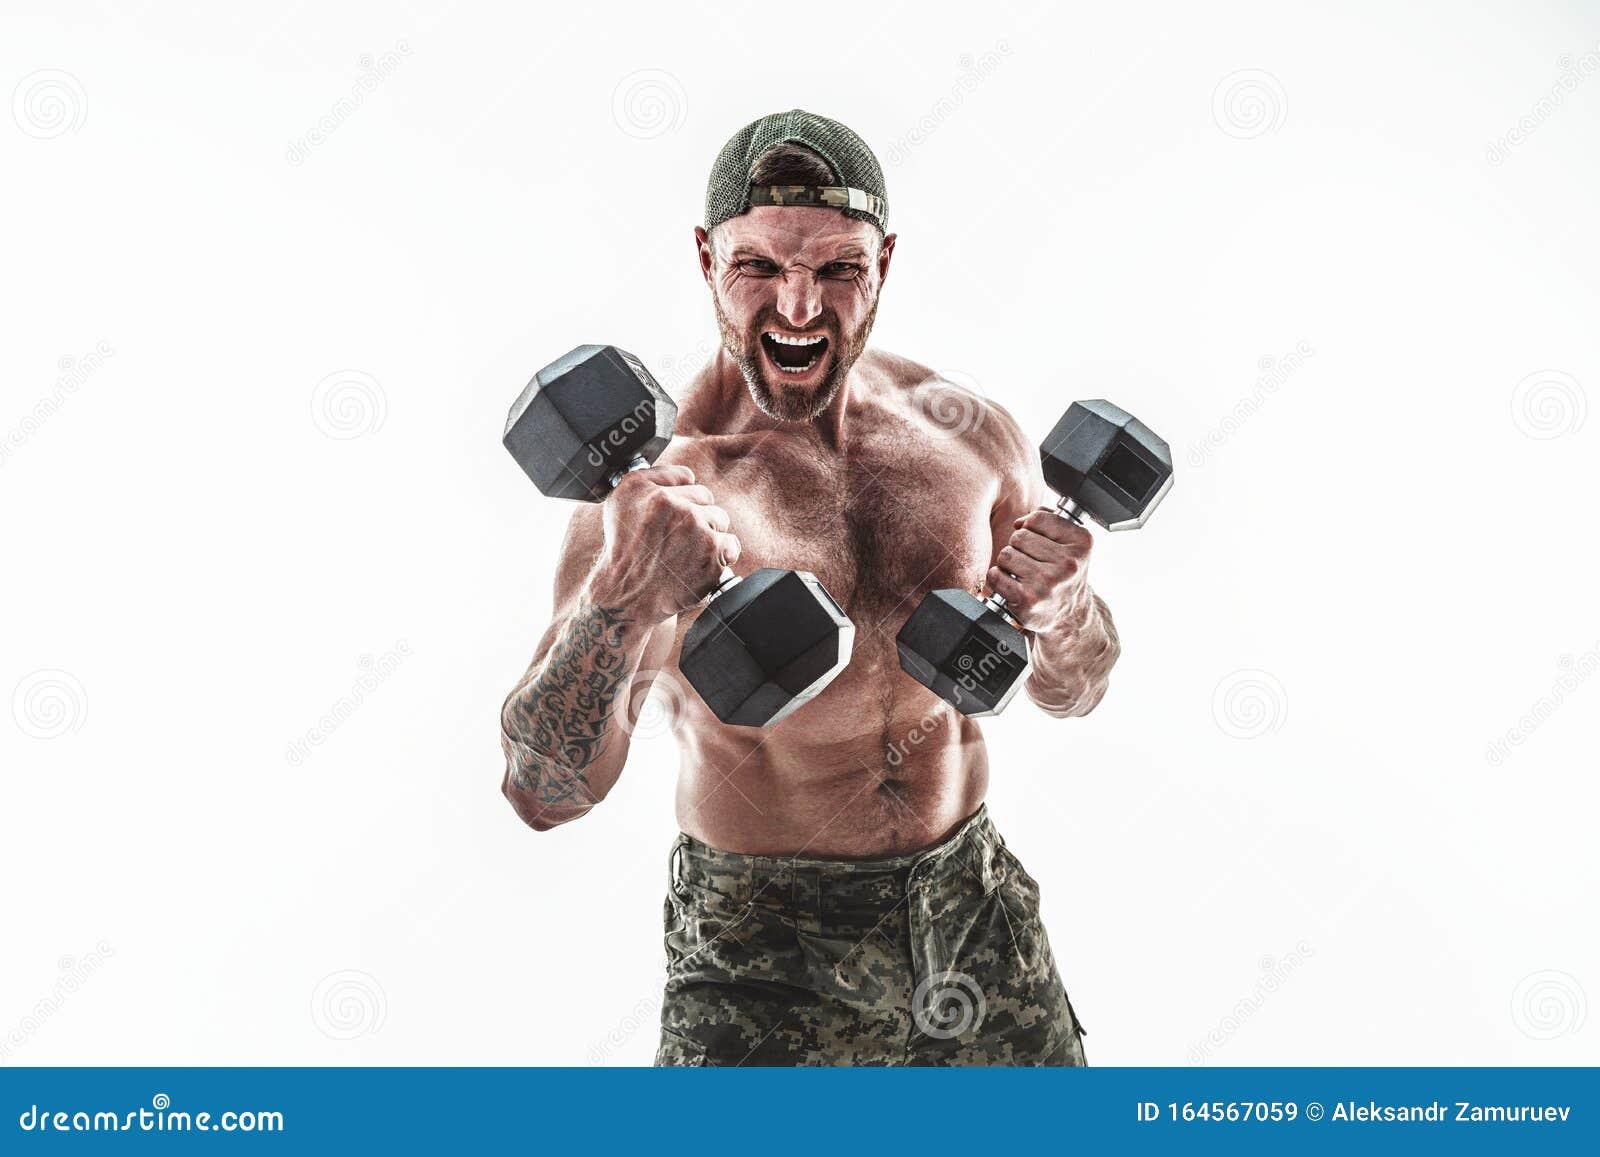 Muscular Athlete Bodybuilder Man Camouflage Pants Stock